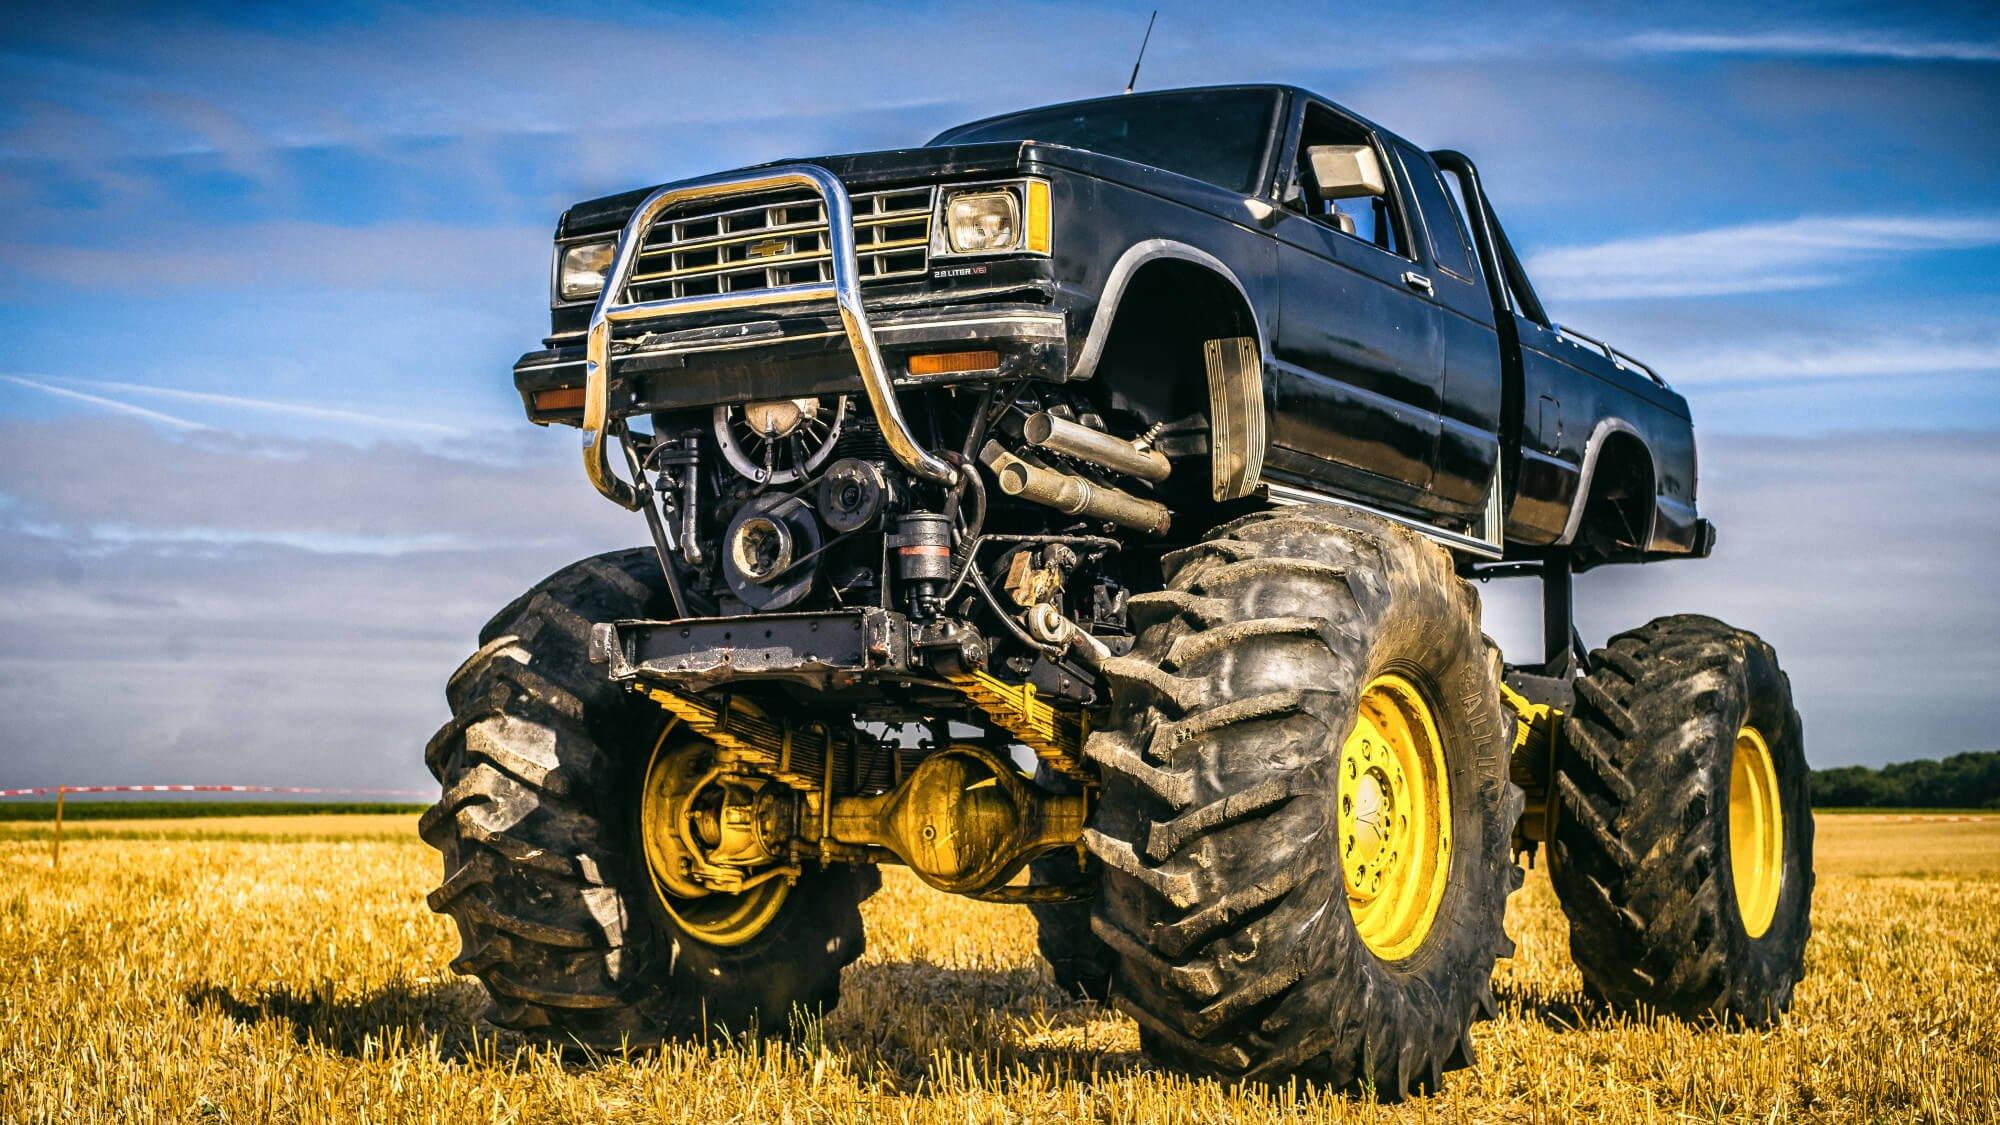 do larger tires ride better